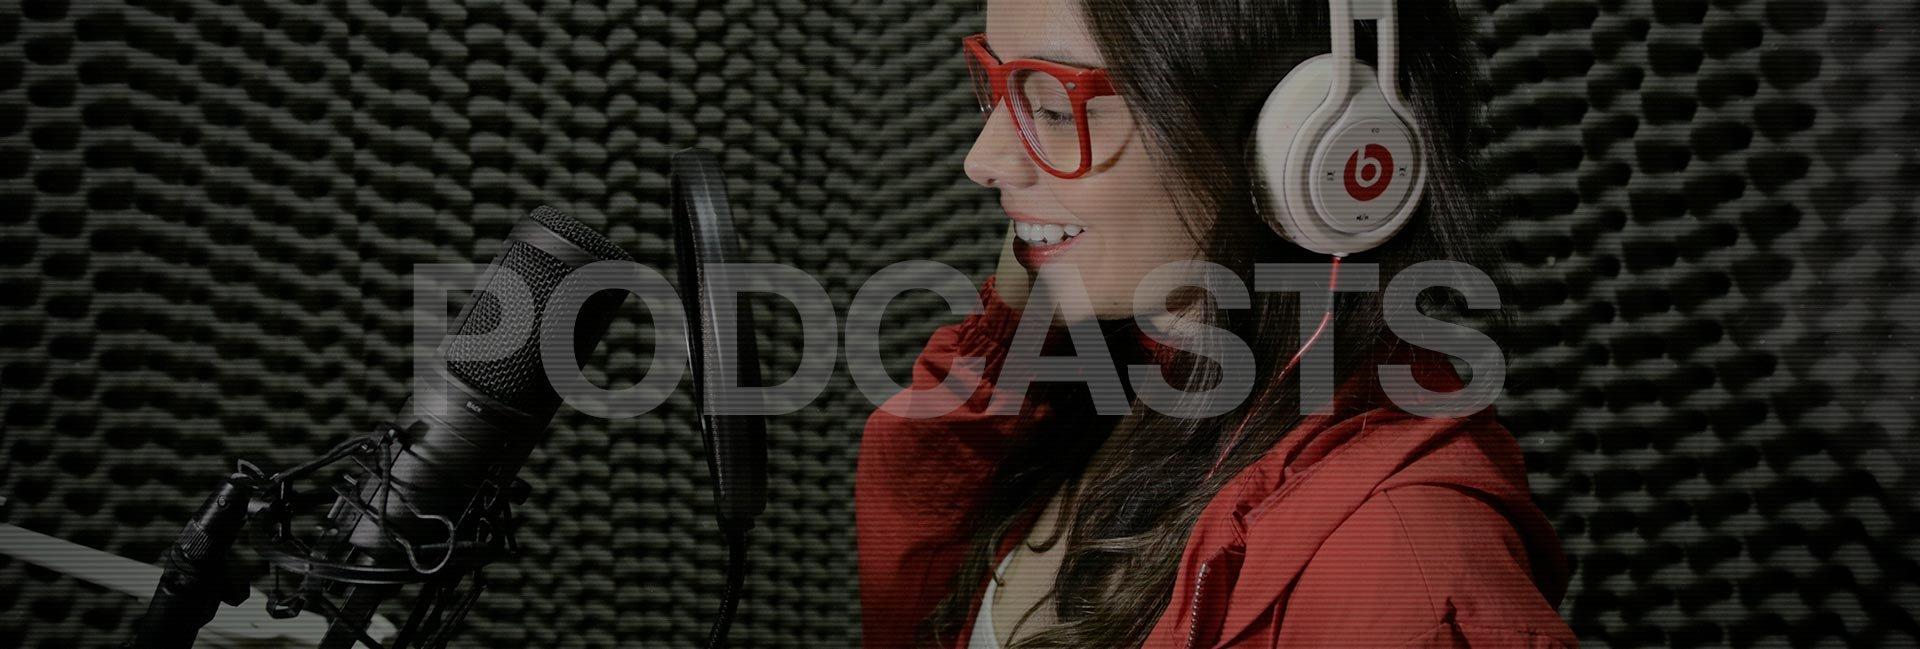 header_PodcastsPragma